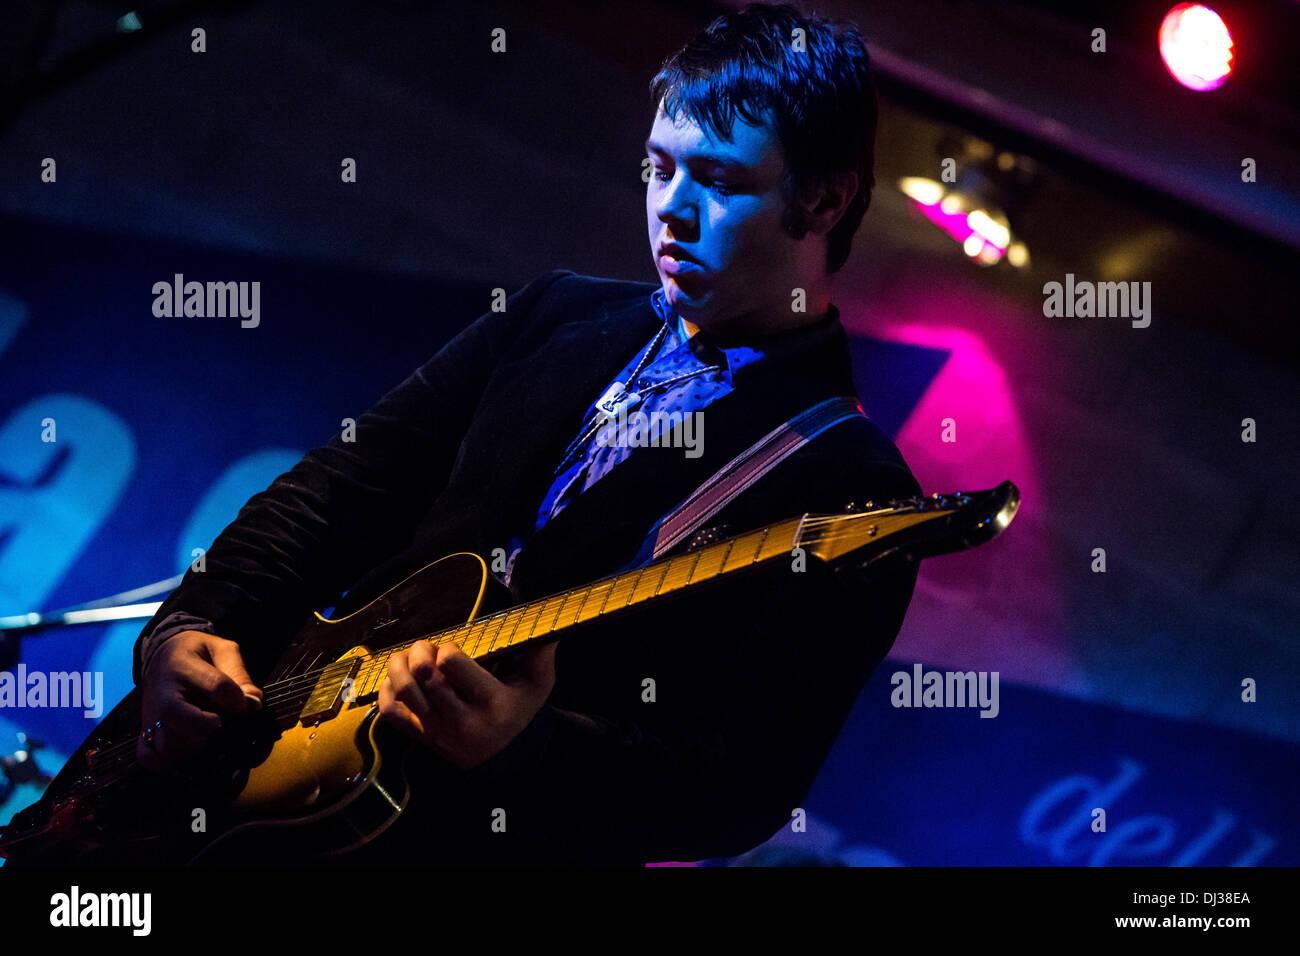 Milan Italy. 19th November 2013. The American indie-rock band CAVEMAN performs live at the Salumeria Della Musica Stock Photo